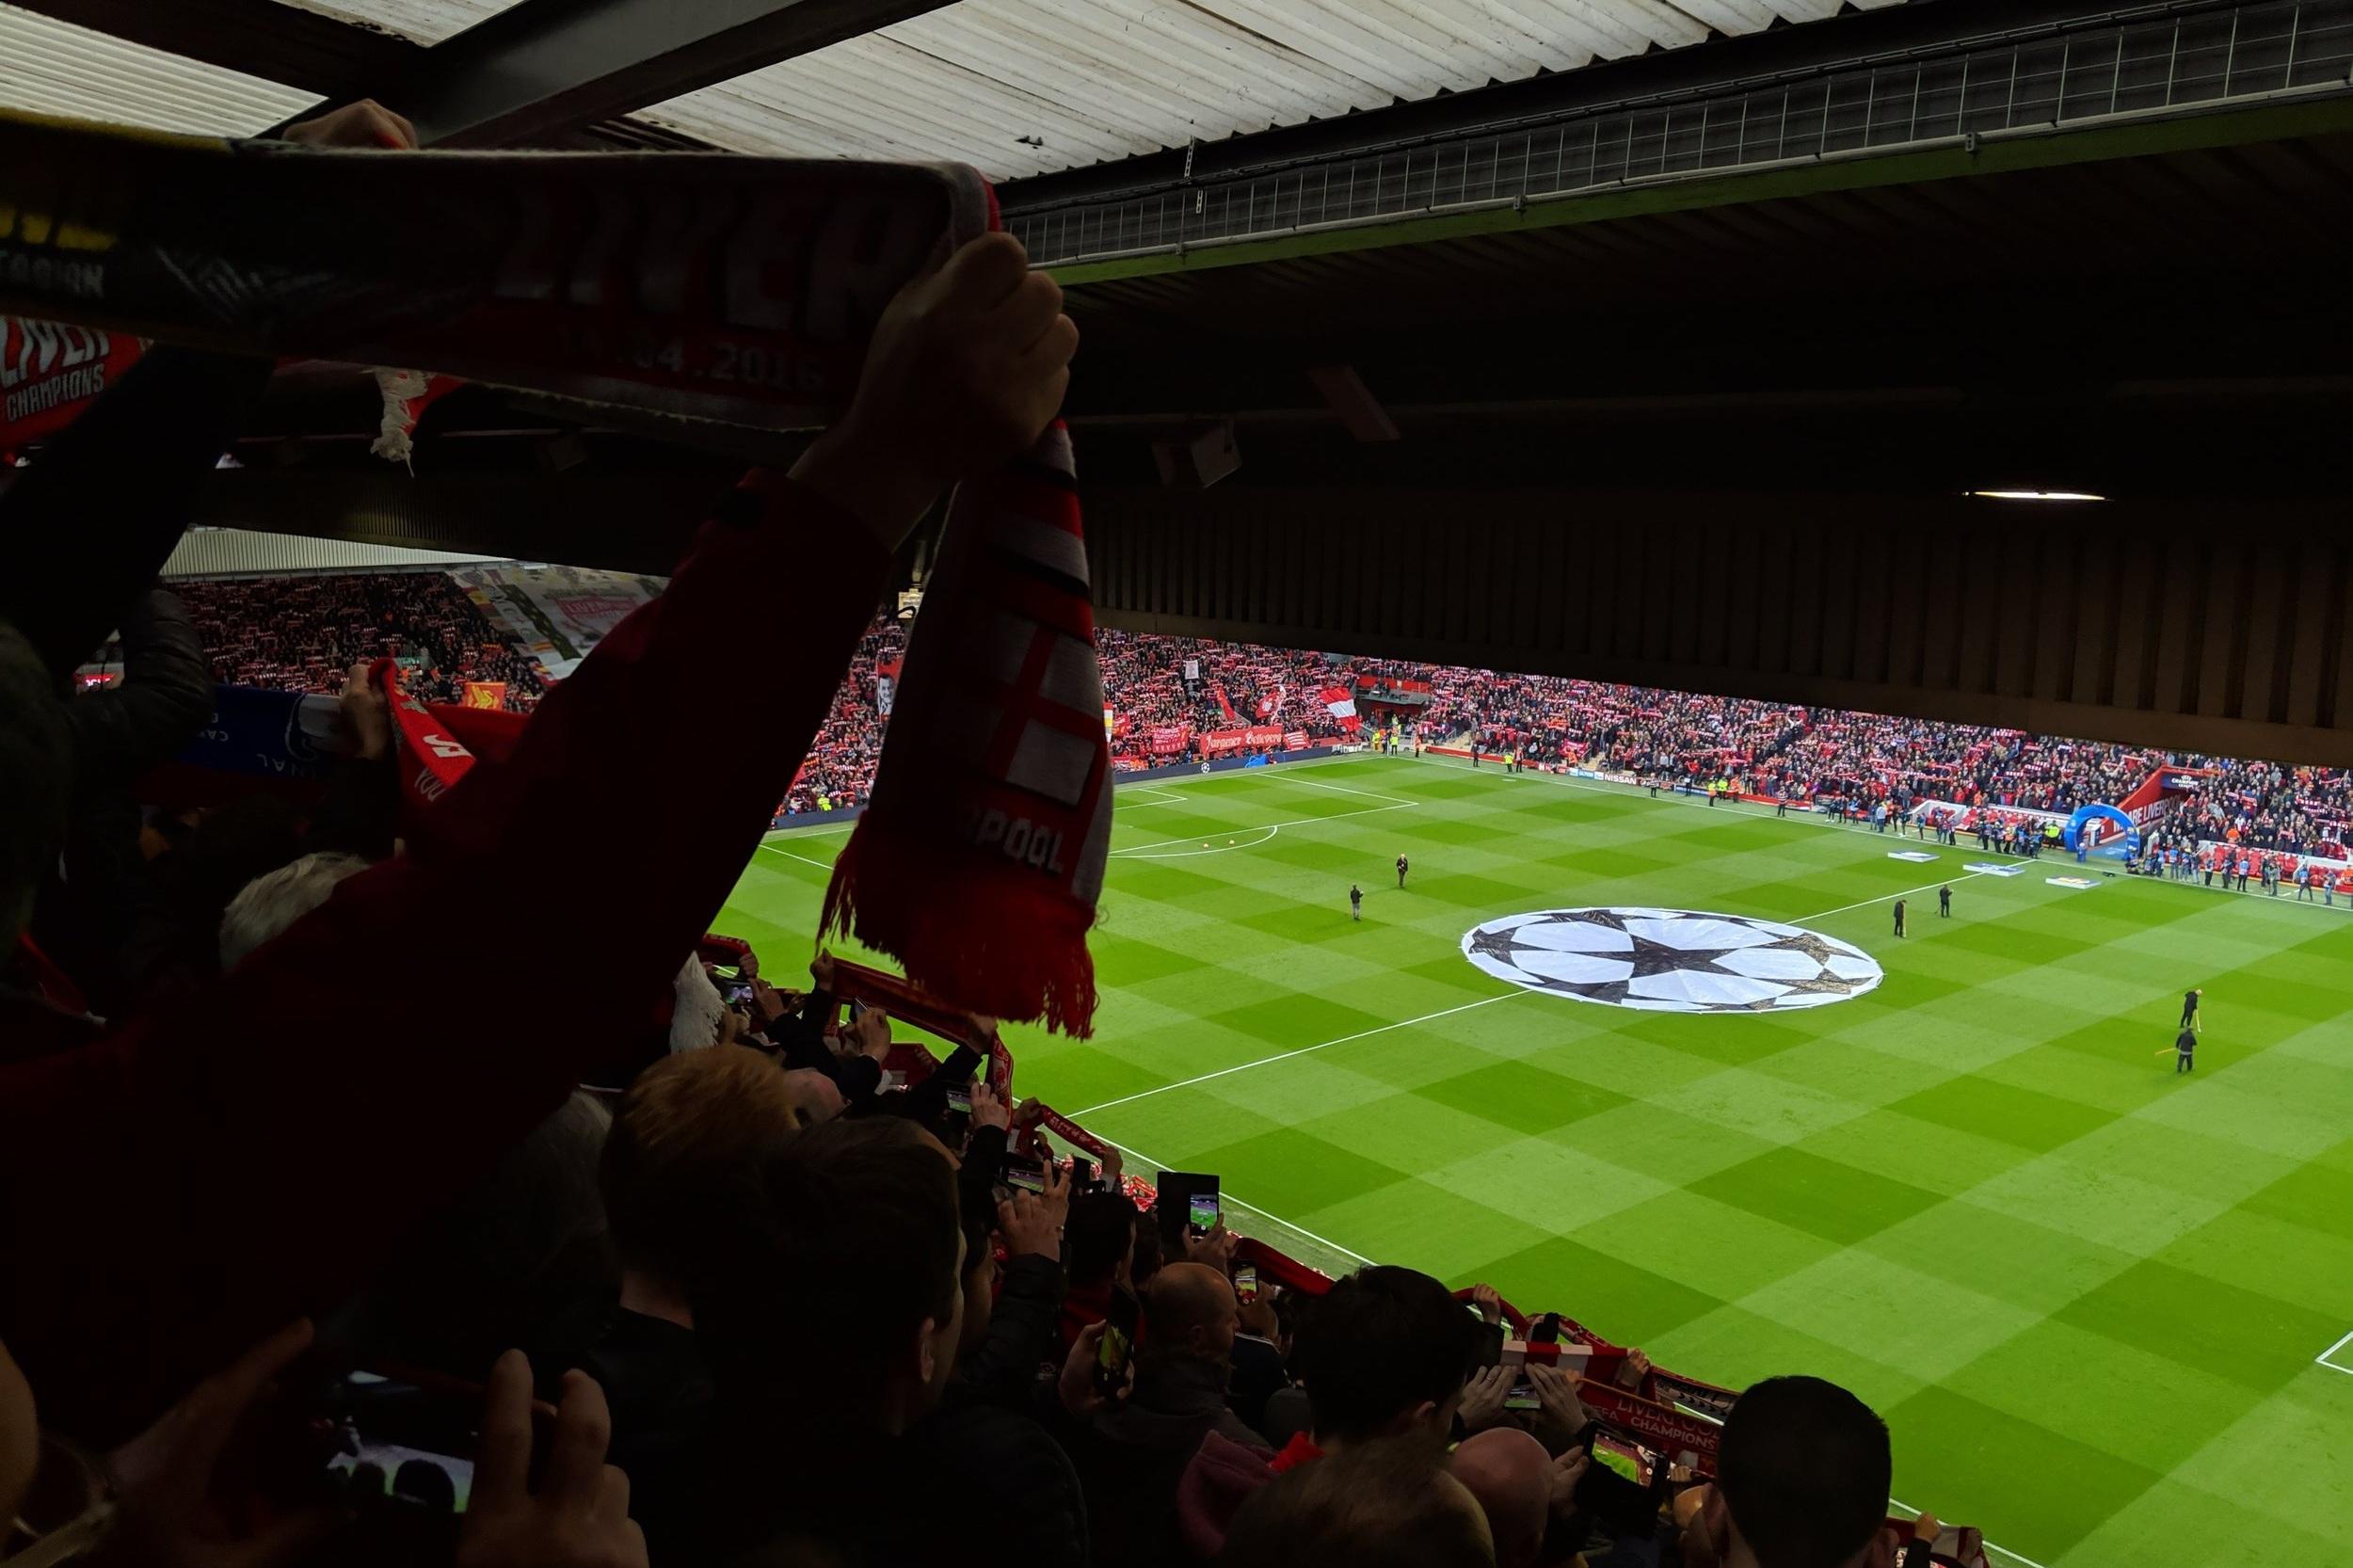 Liverpool 4-0 Barcelona - Pretty good night at Anfield last season.